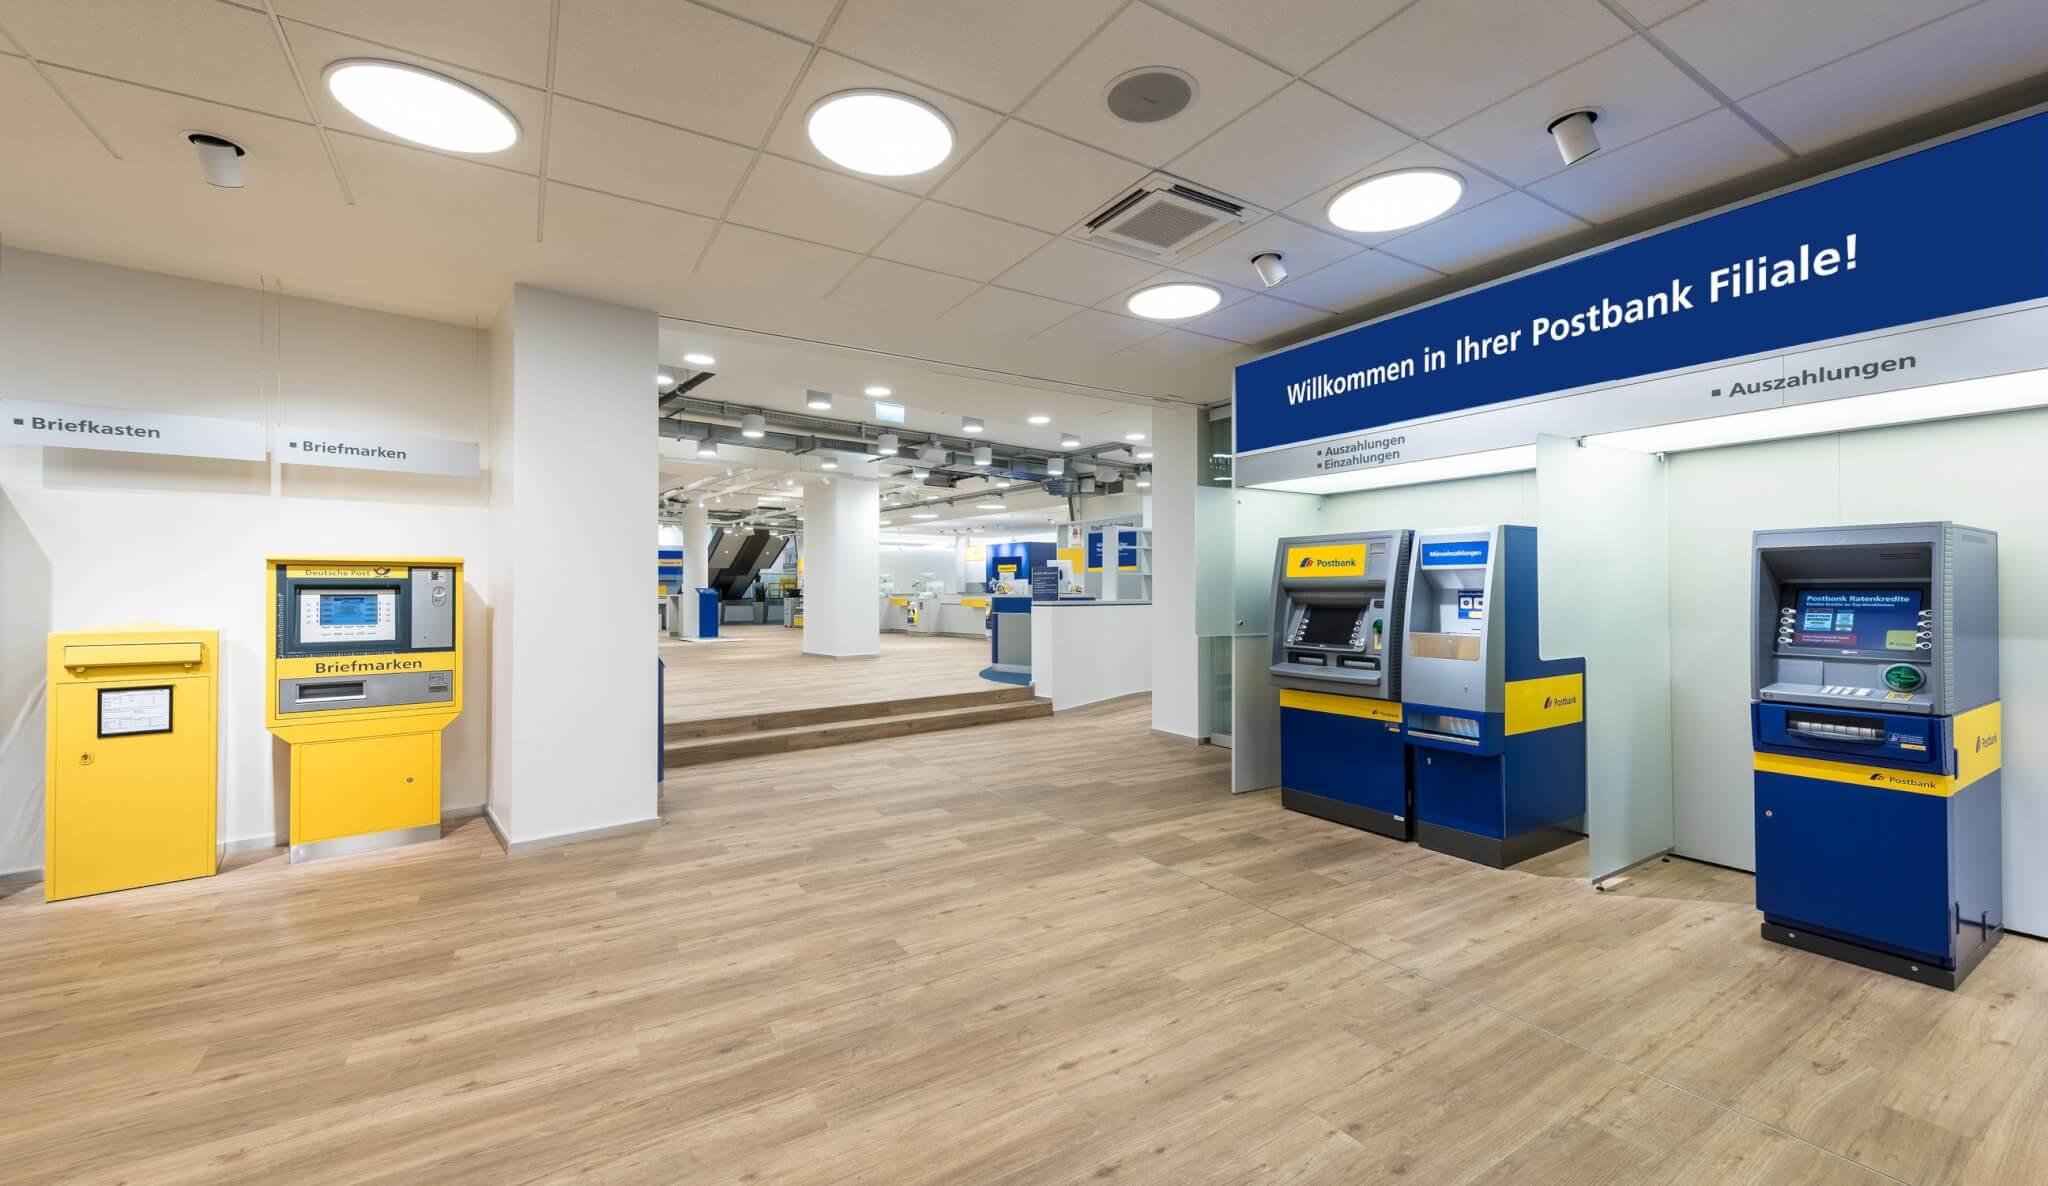 postbank finanzcenter bonn SF82301 HDR Bearbeitet Bearbeitet